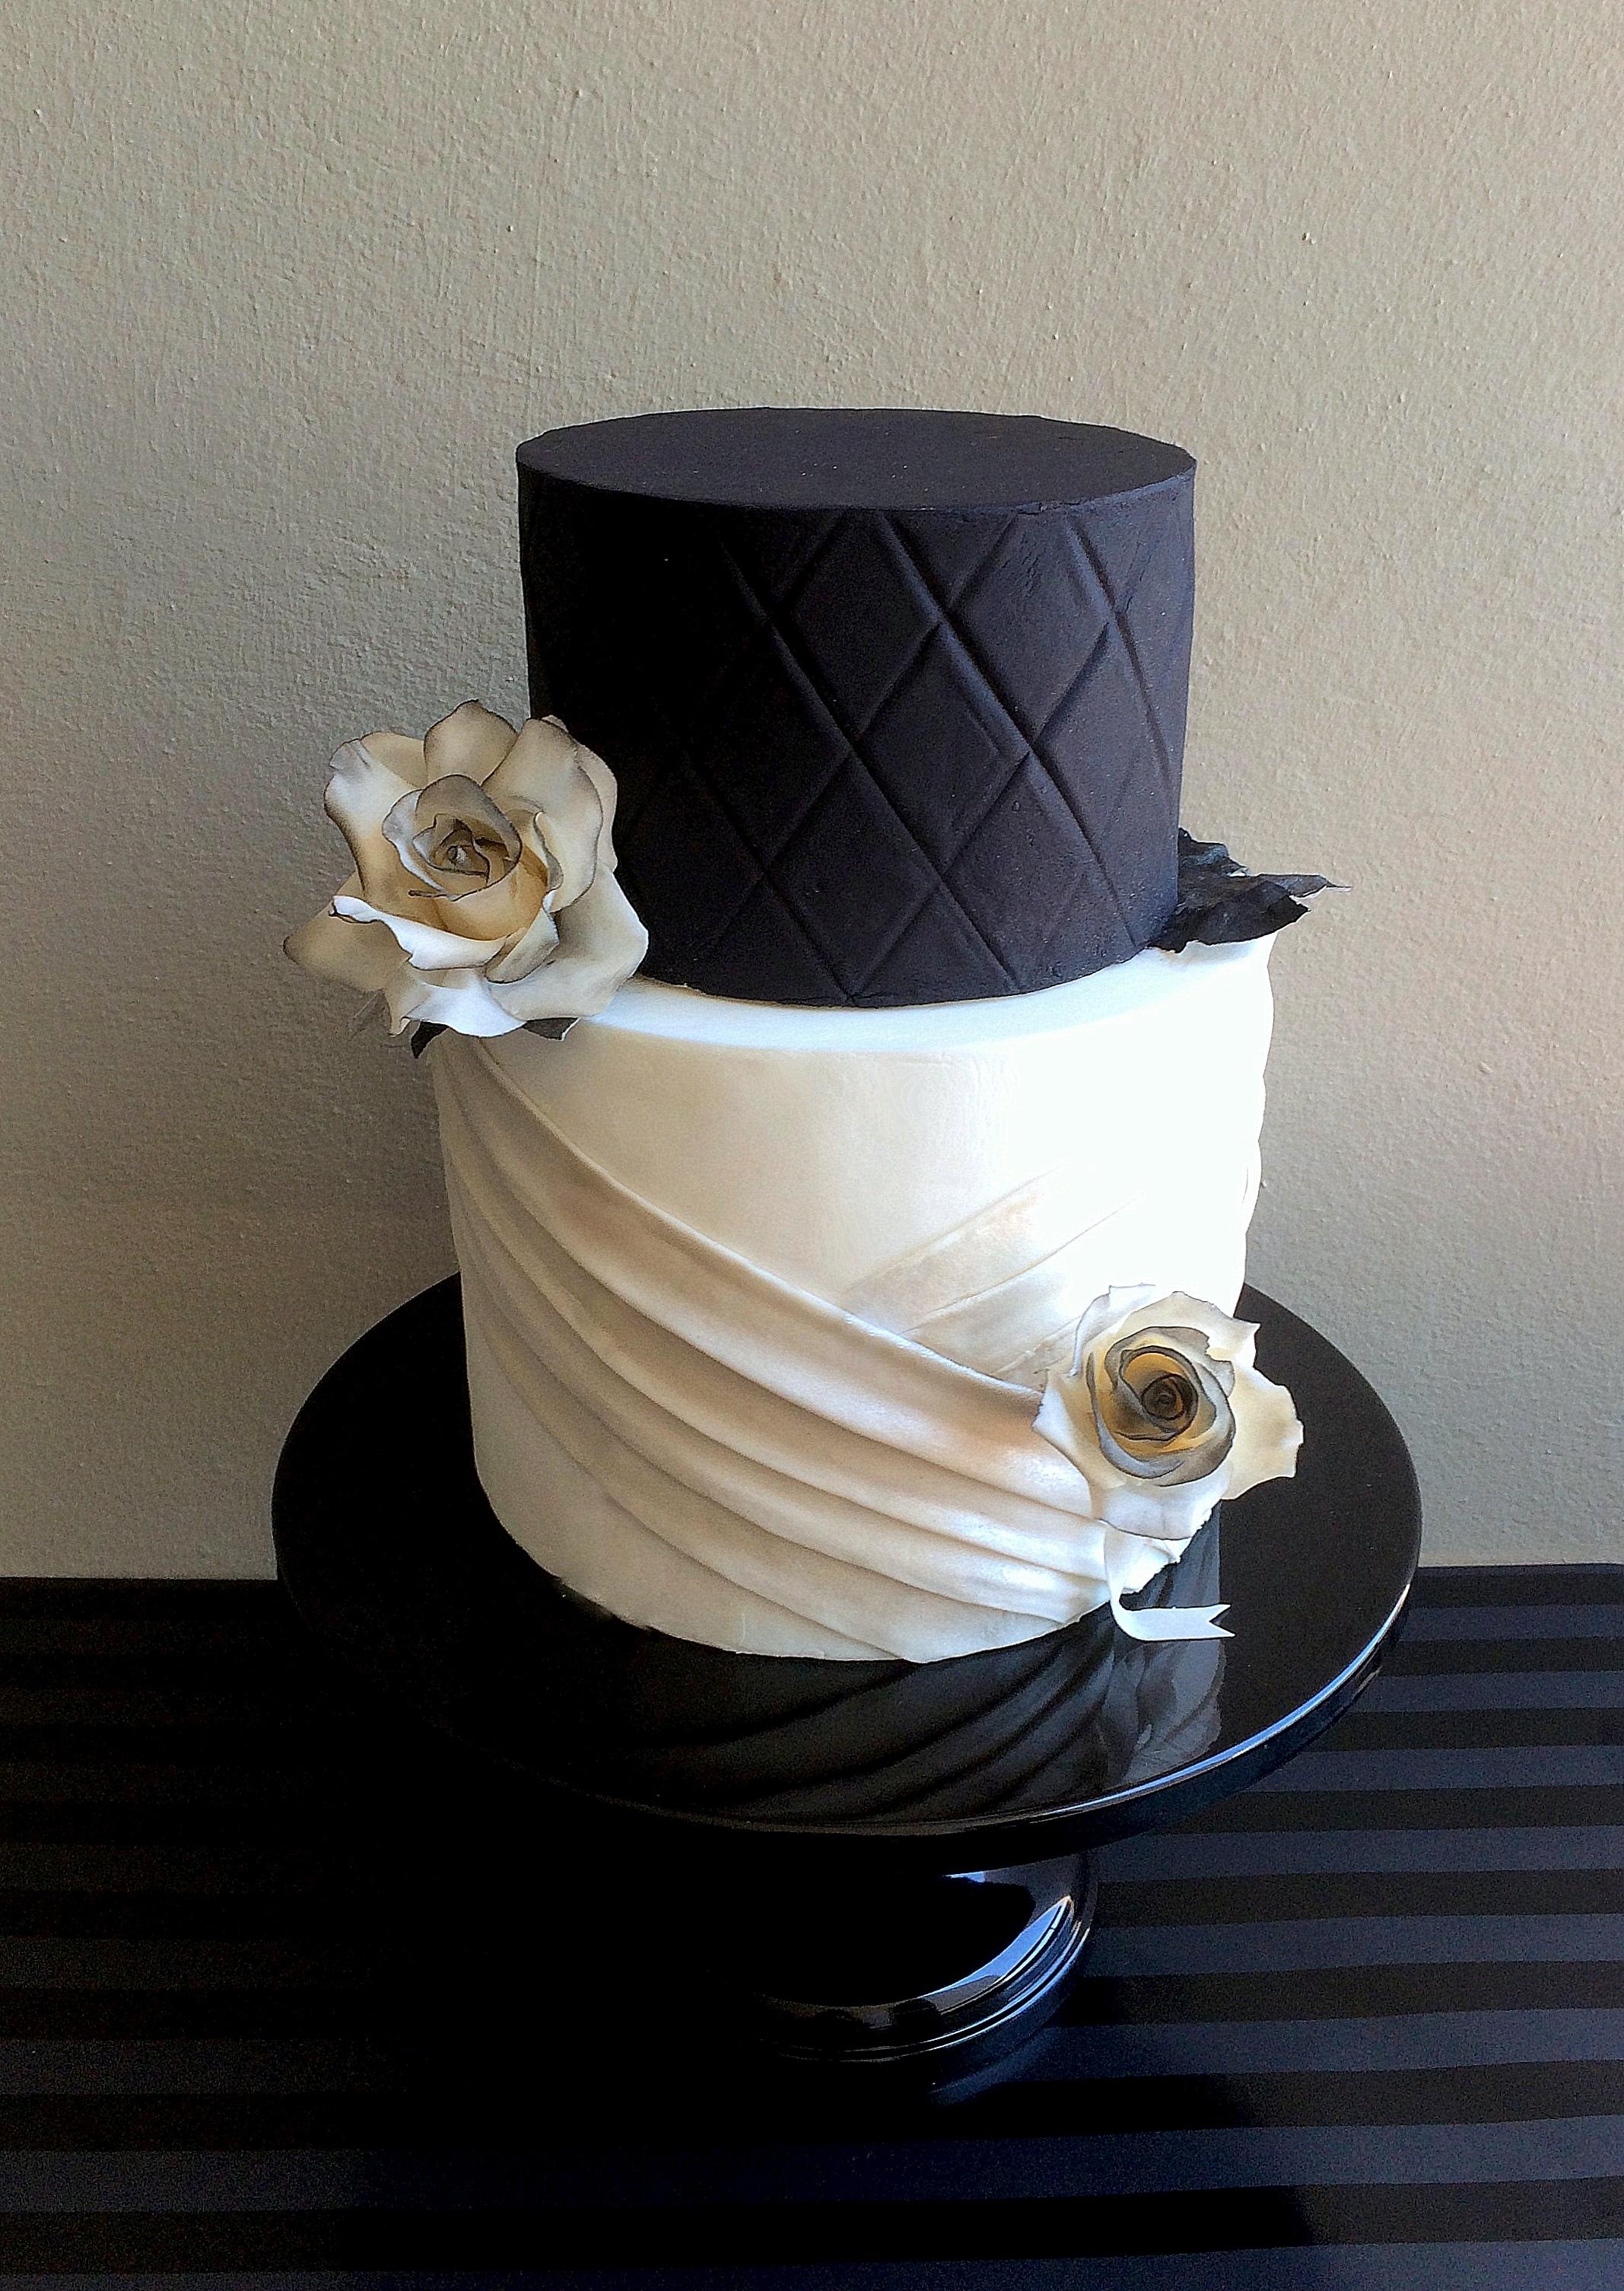 Tina-Scott-Parashar-Tina-Scott-Parashars-Cake-Design-Wedding-Elegant-2.jpeg#asset:10195